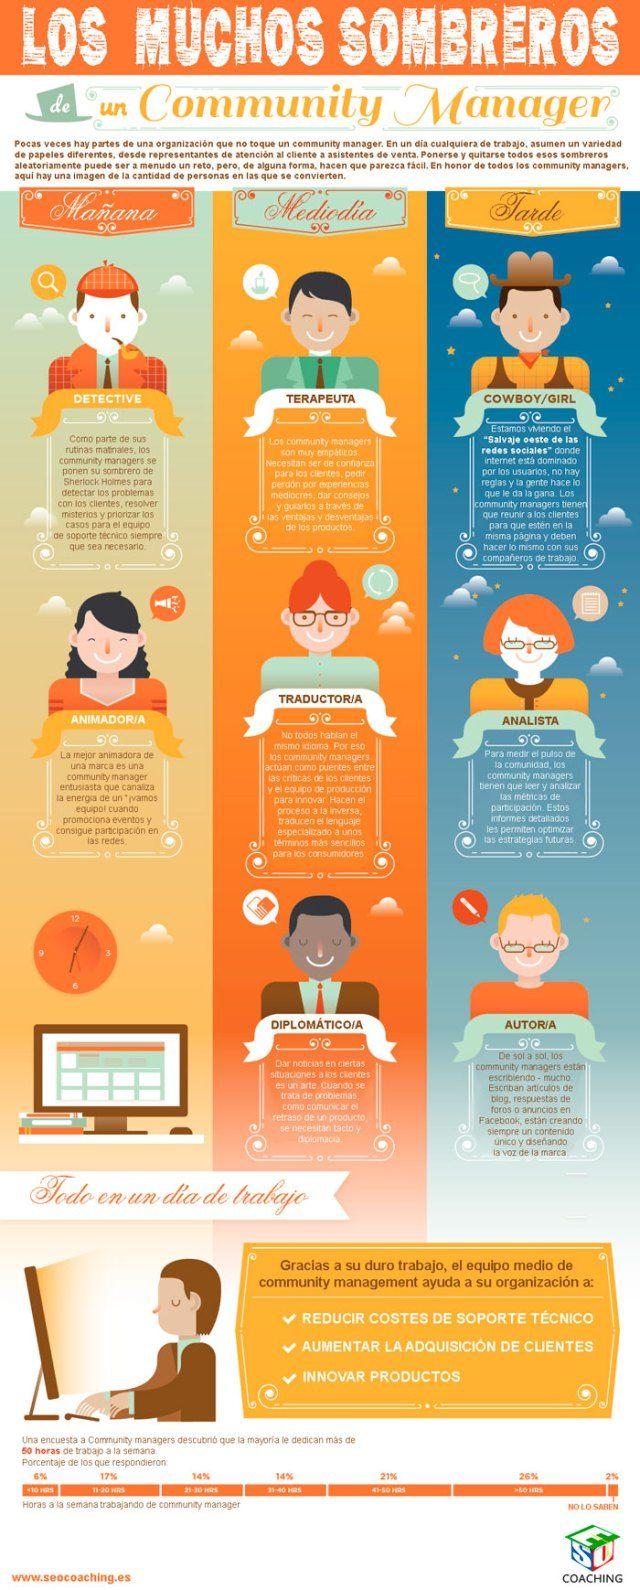 Los muchos sombreros del Community Manager #infografia #infographic #socialmedia